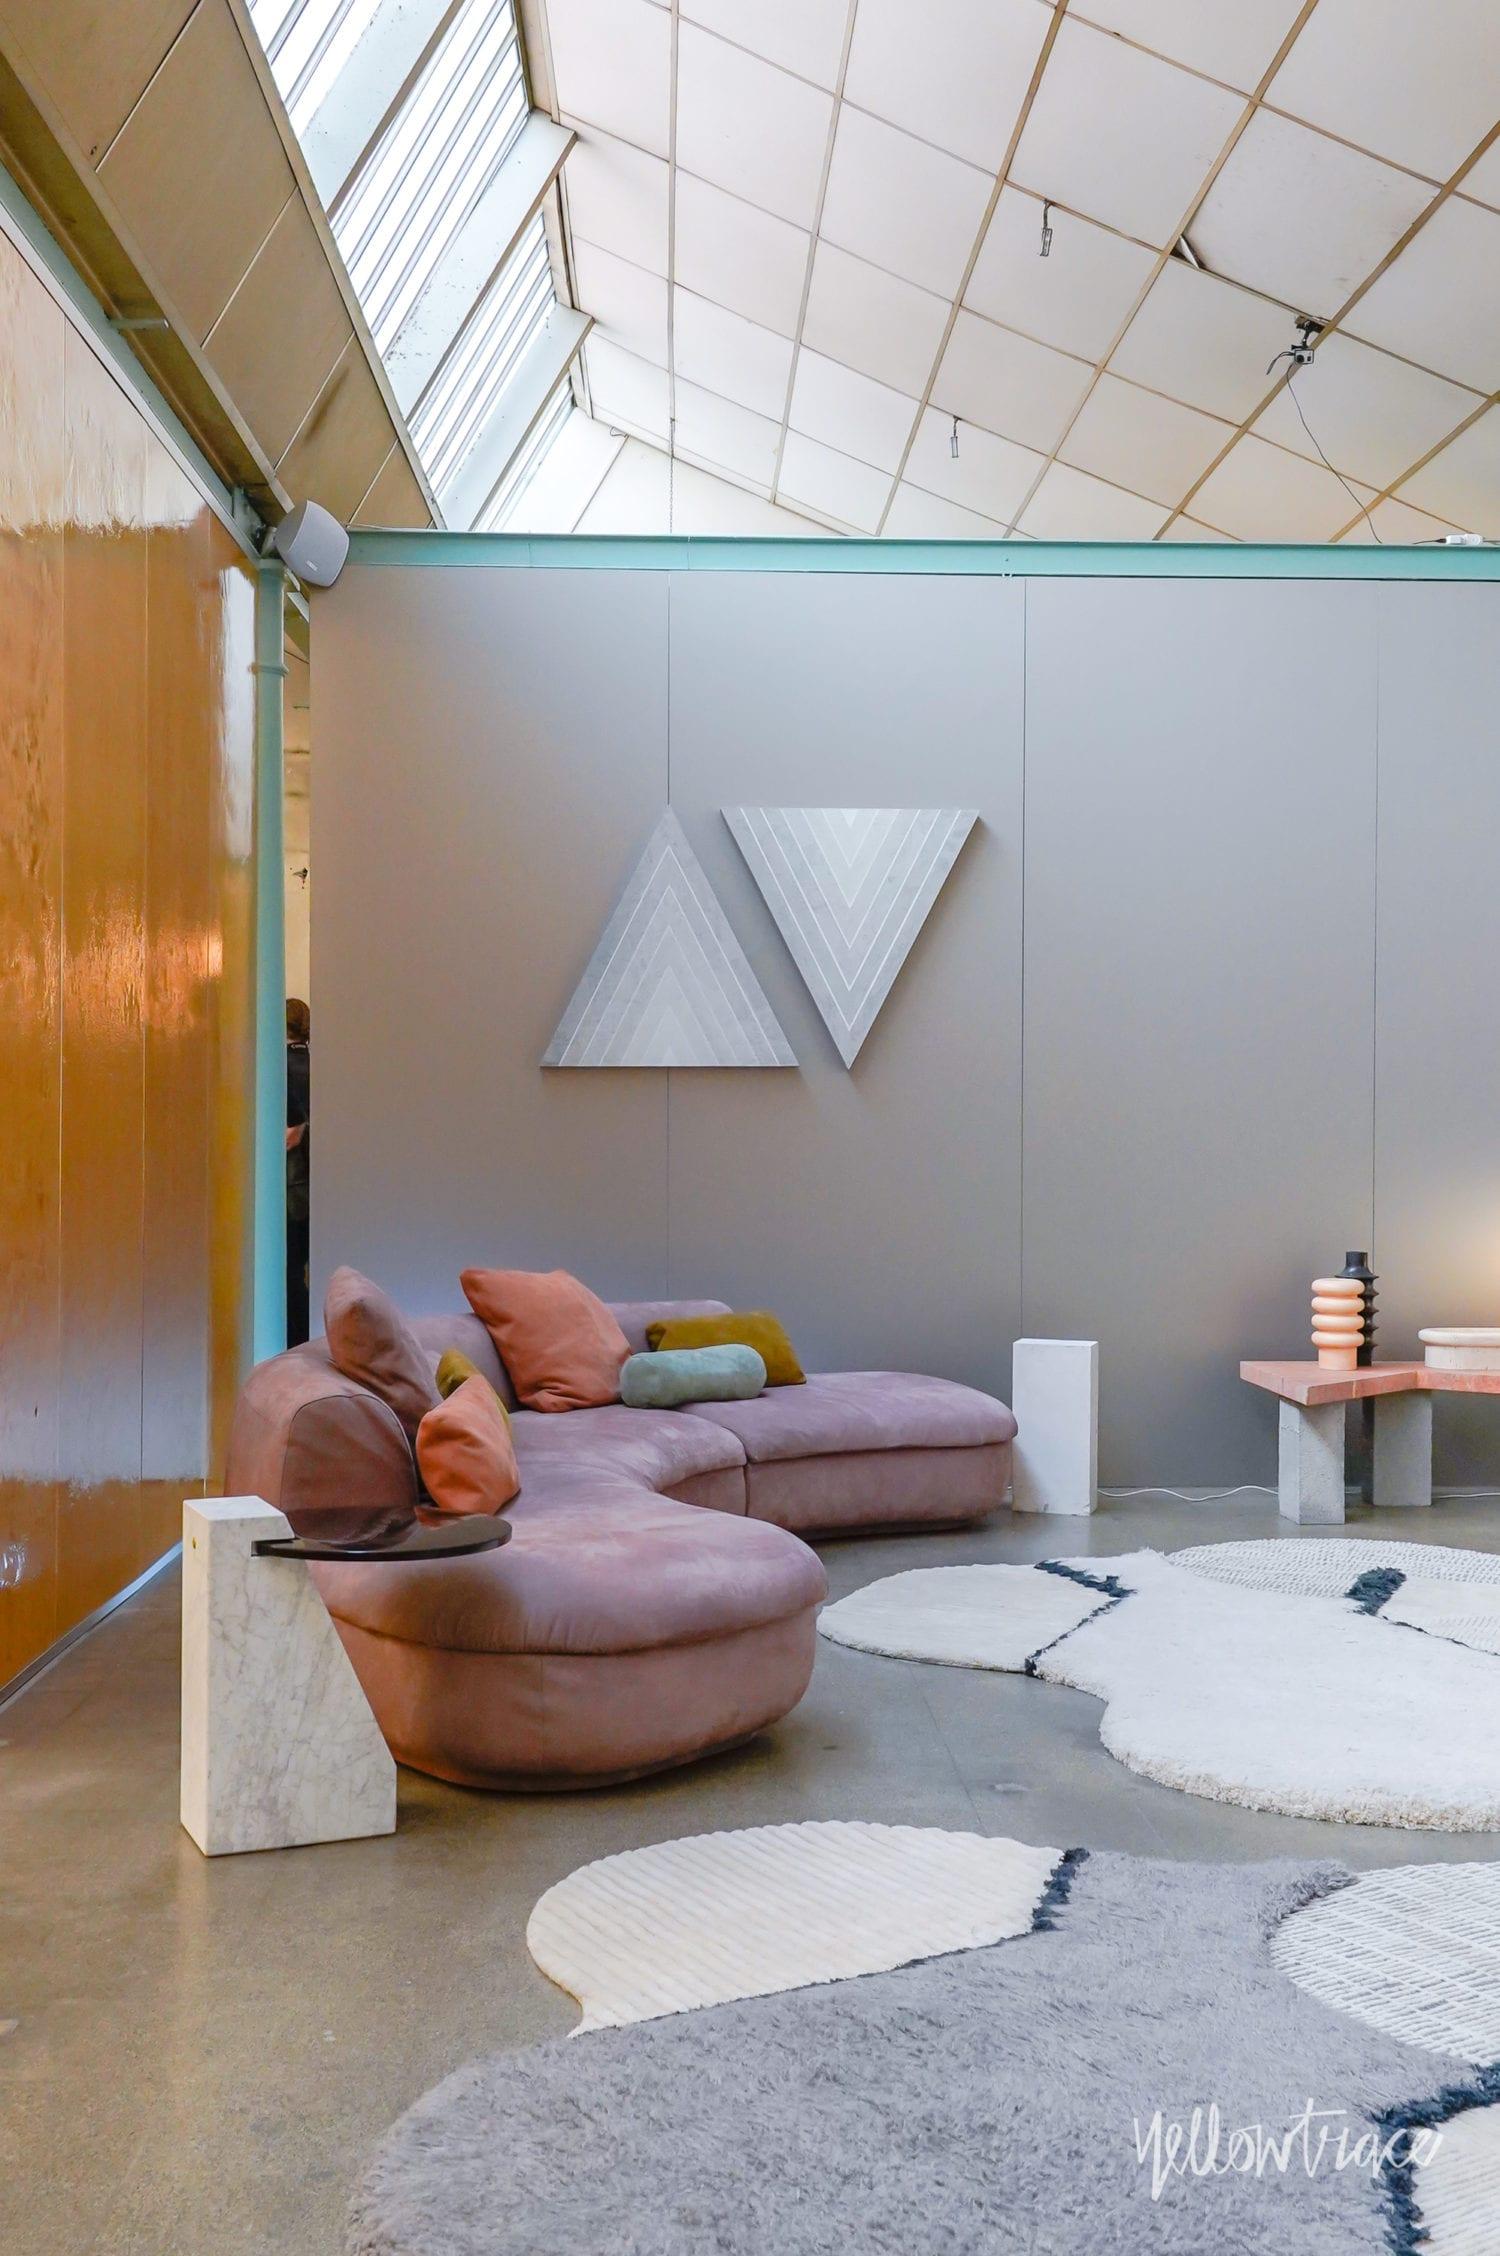 Les Arcanistes Studiopepe At Milan Design Week 2019 Photo Nick Hughes Yellowtrace 15a